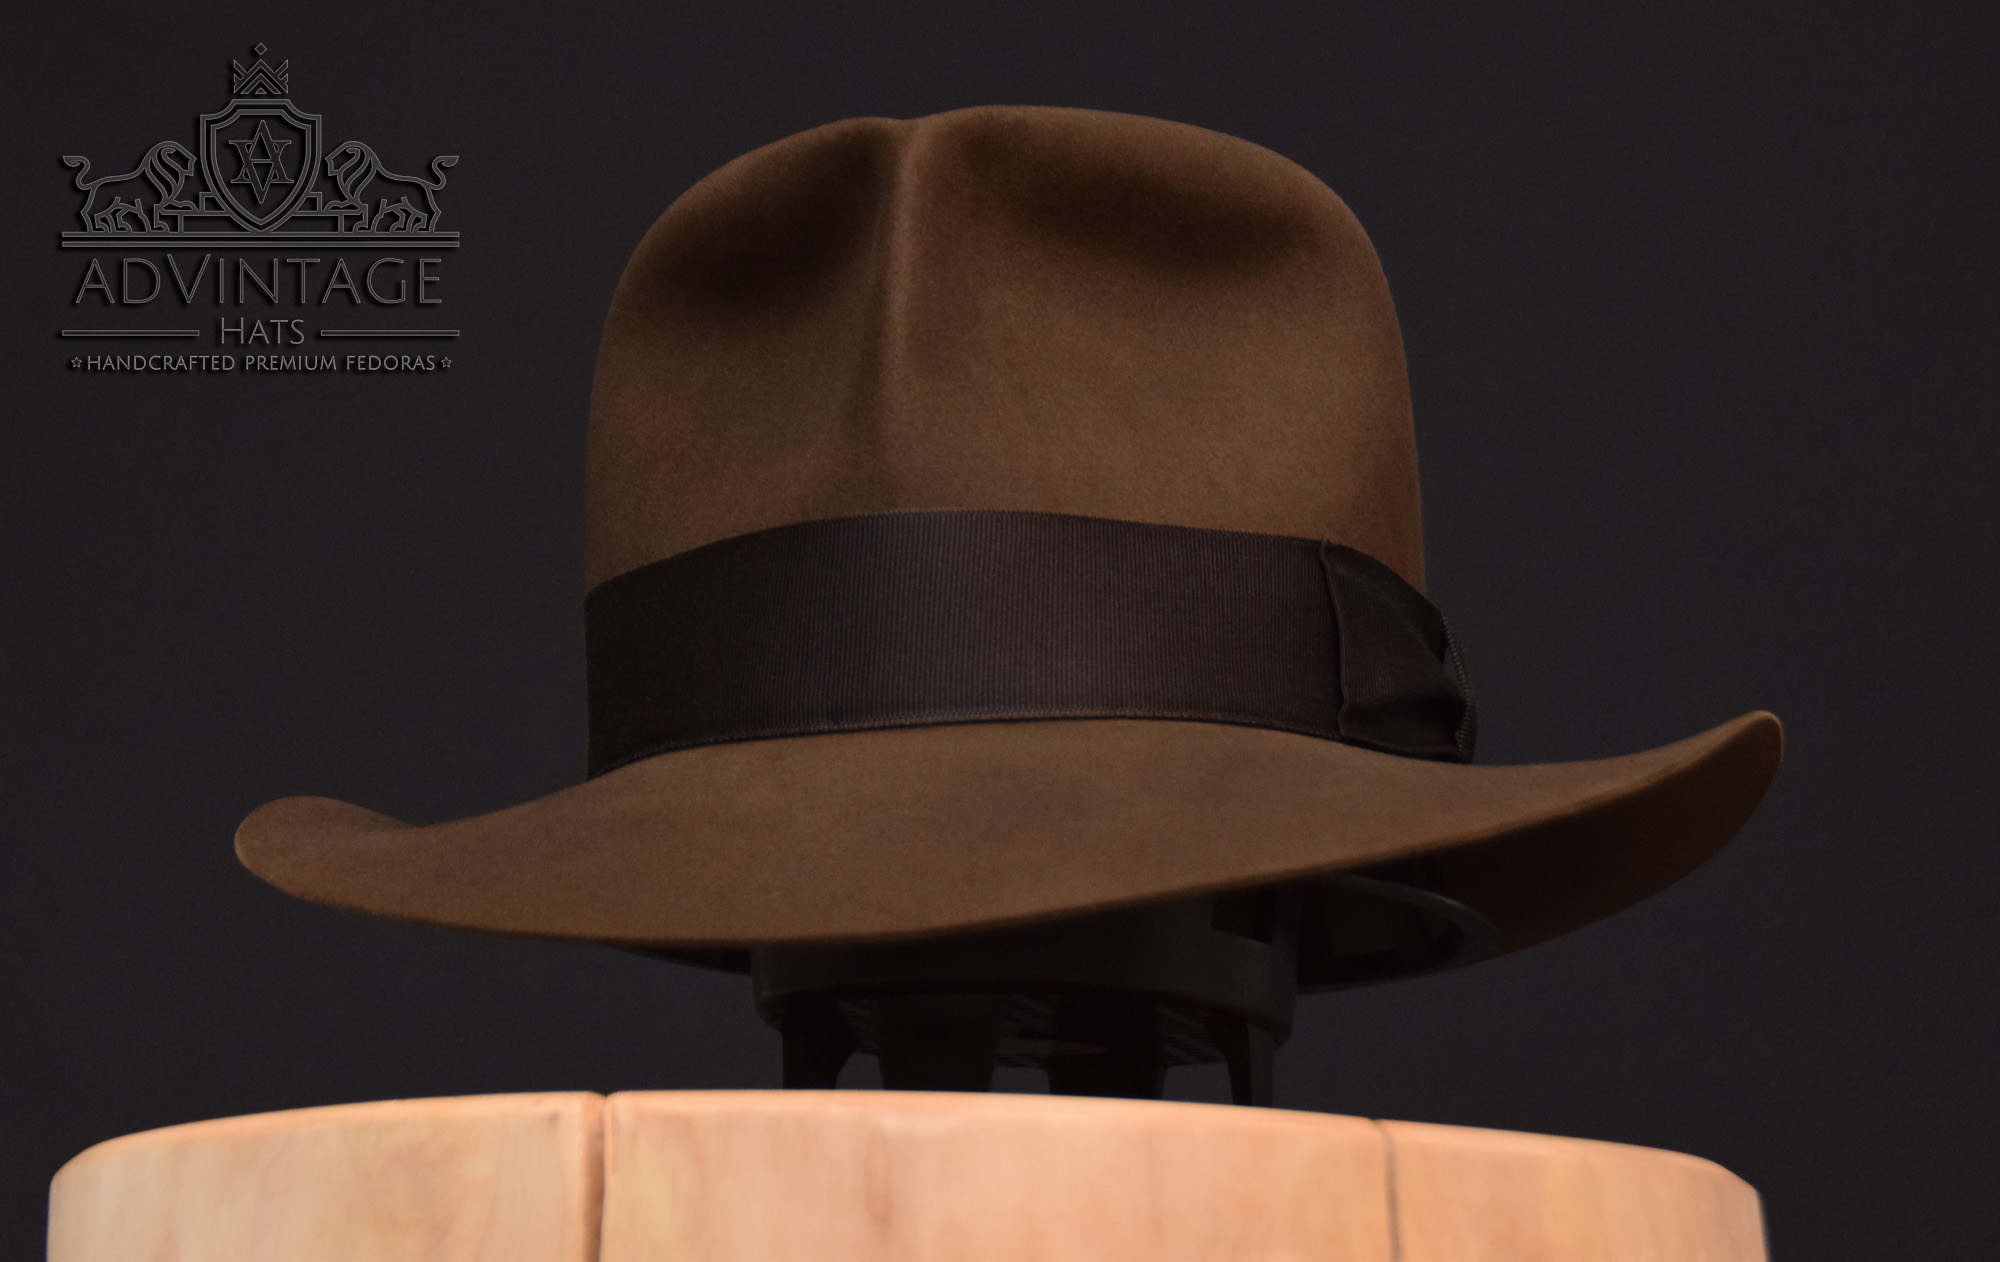 Indiana Jones Fedora Hut Hat raiders idol grab sable